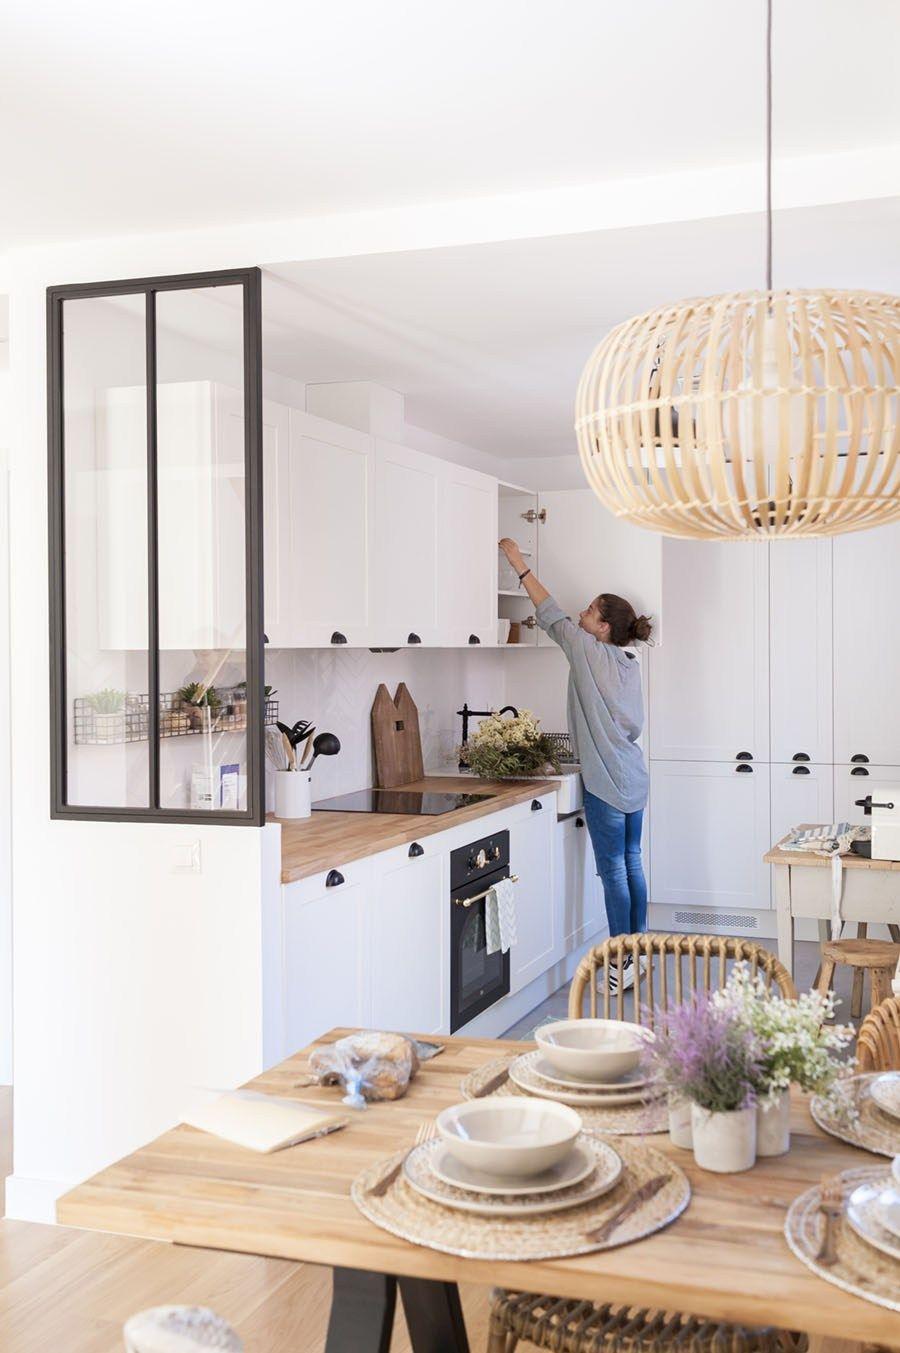 Küche und esszimmer designs un joli appartement pour séjourner à madrid  lights  pinterest